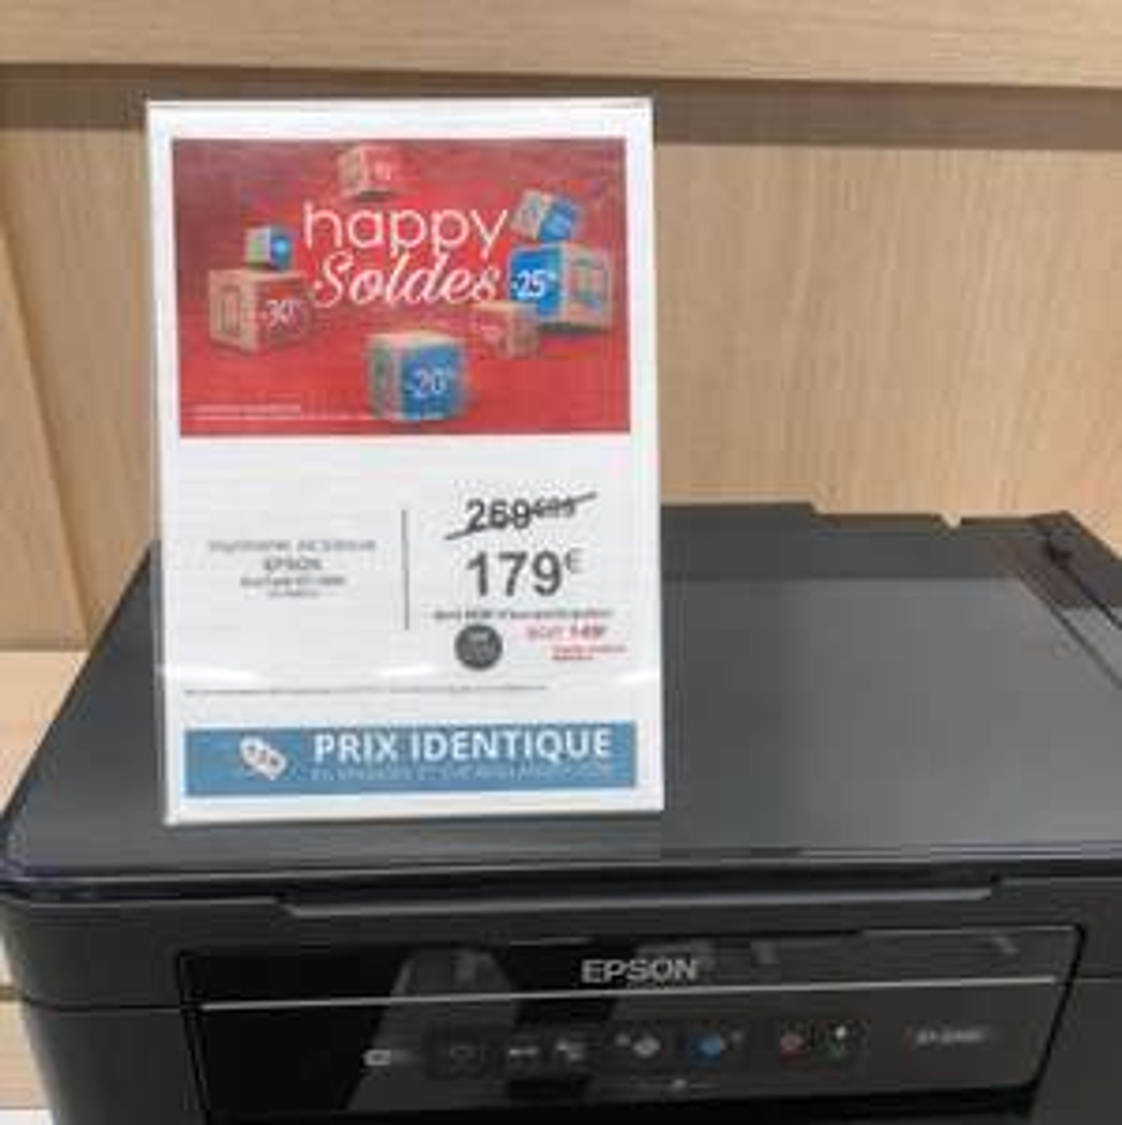 Imprimante Epson EcoTank ET-2600 (via ODR de 30€)